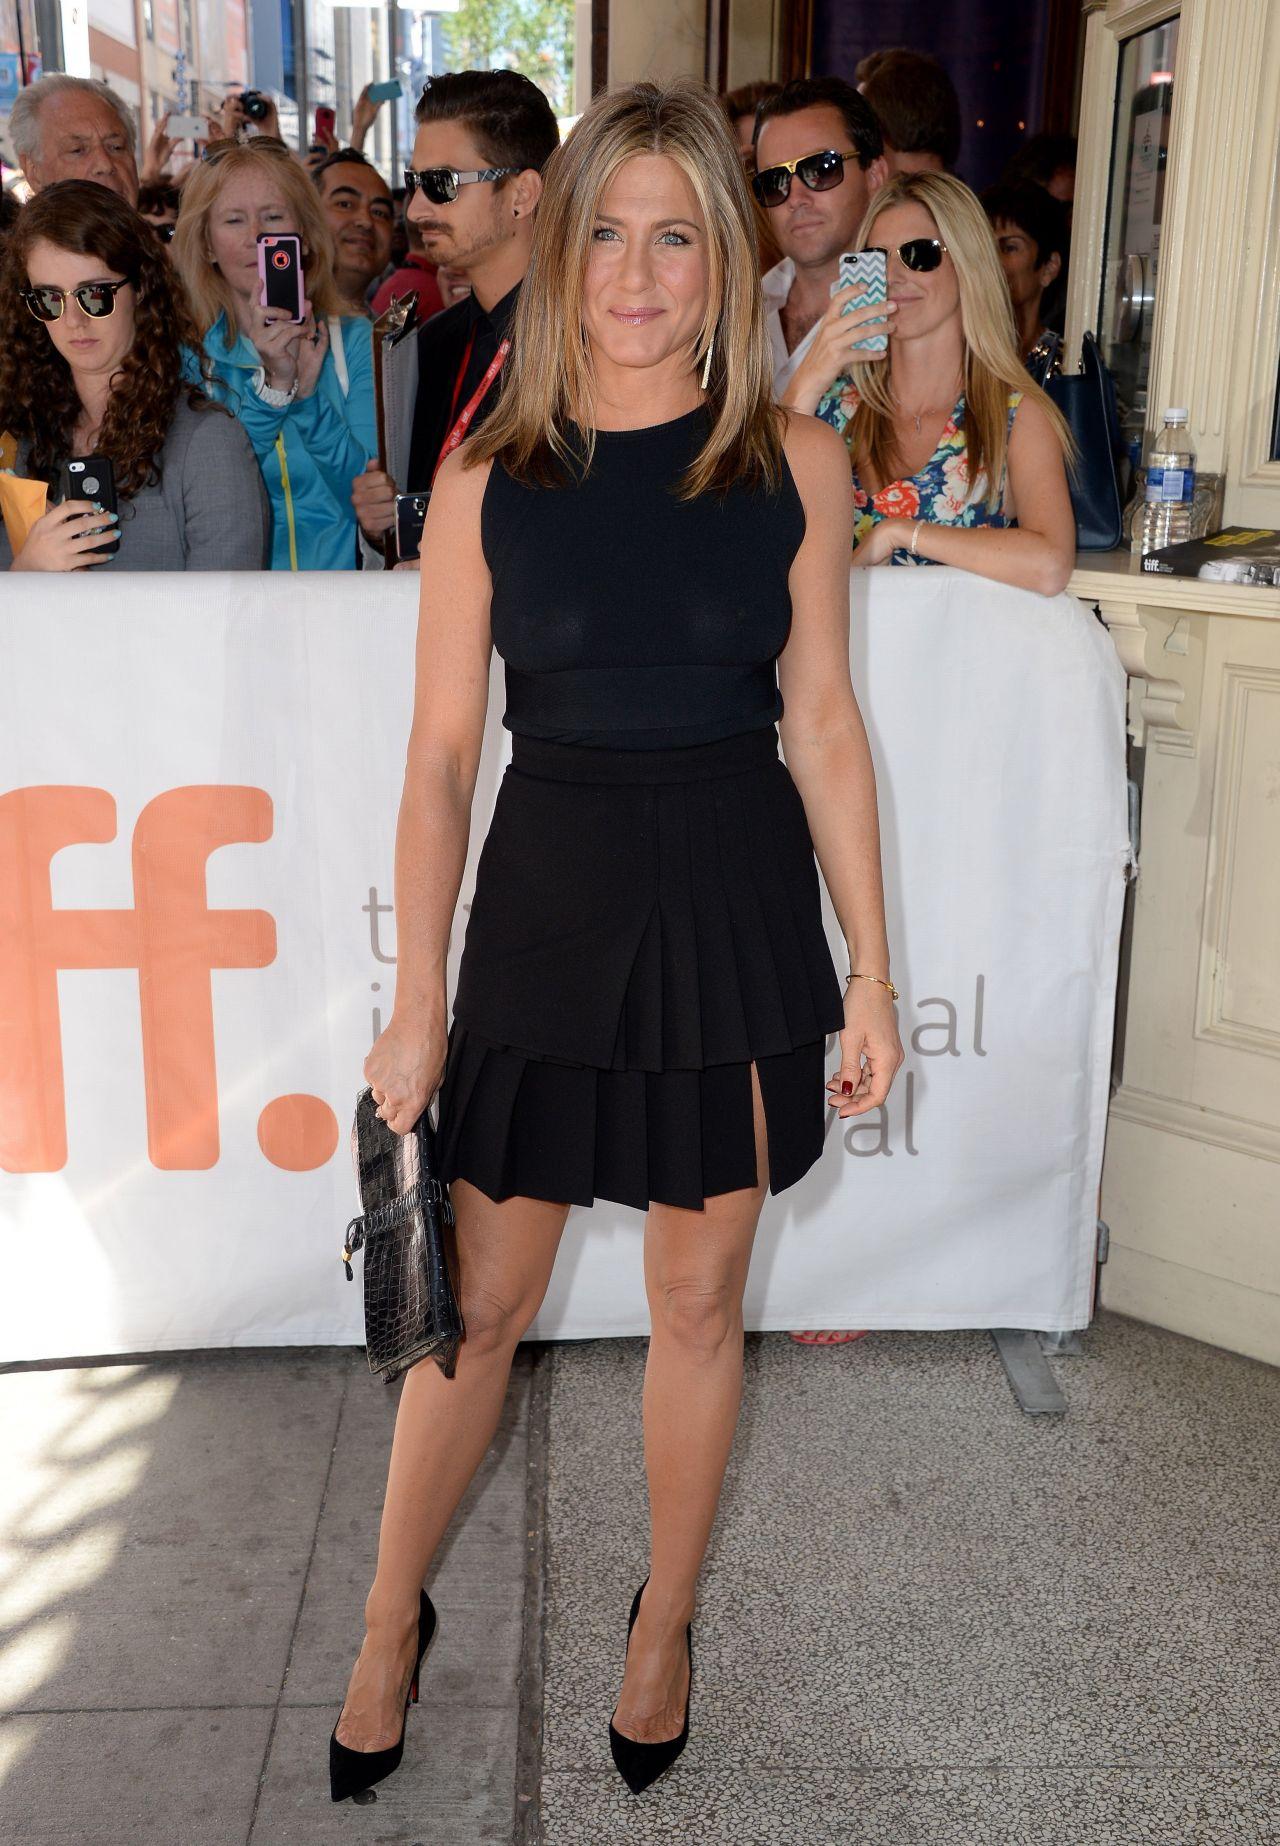 Jennifer Aniston Cake Premiere 2014 Tiff